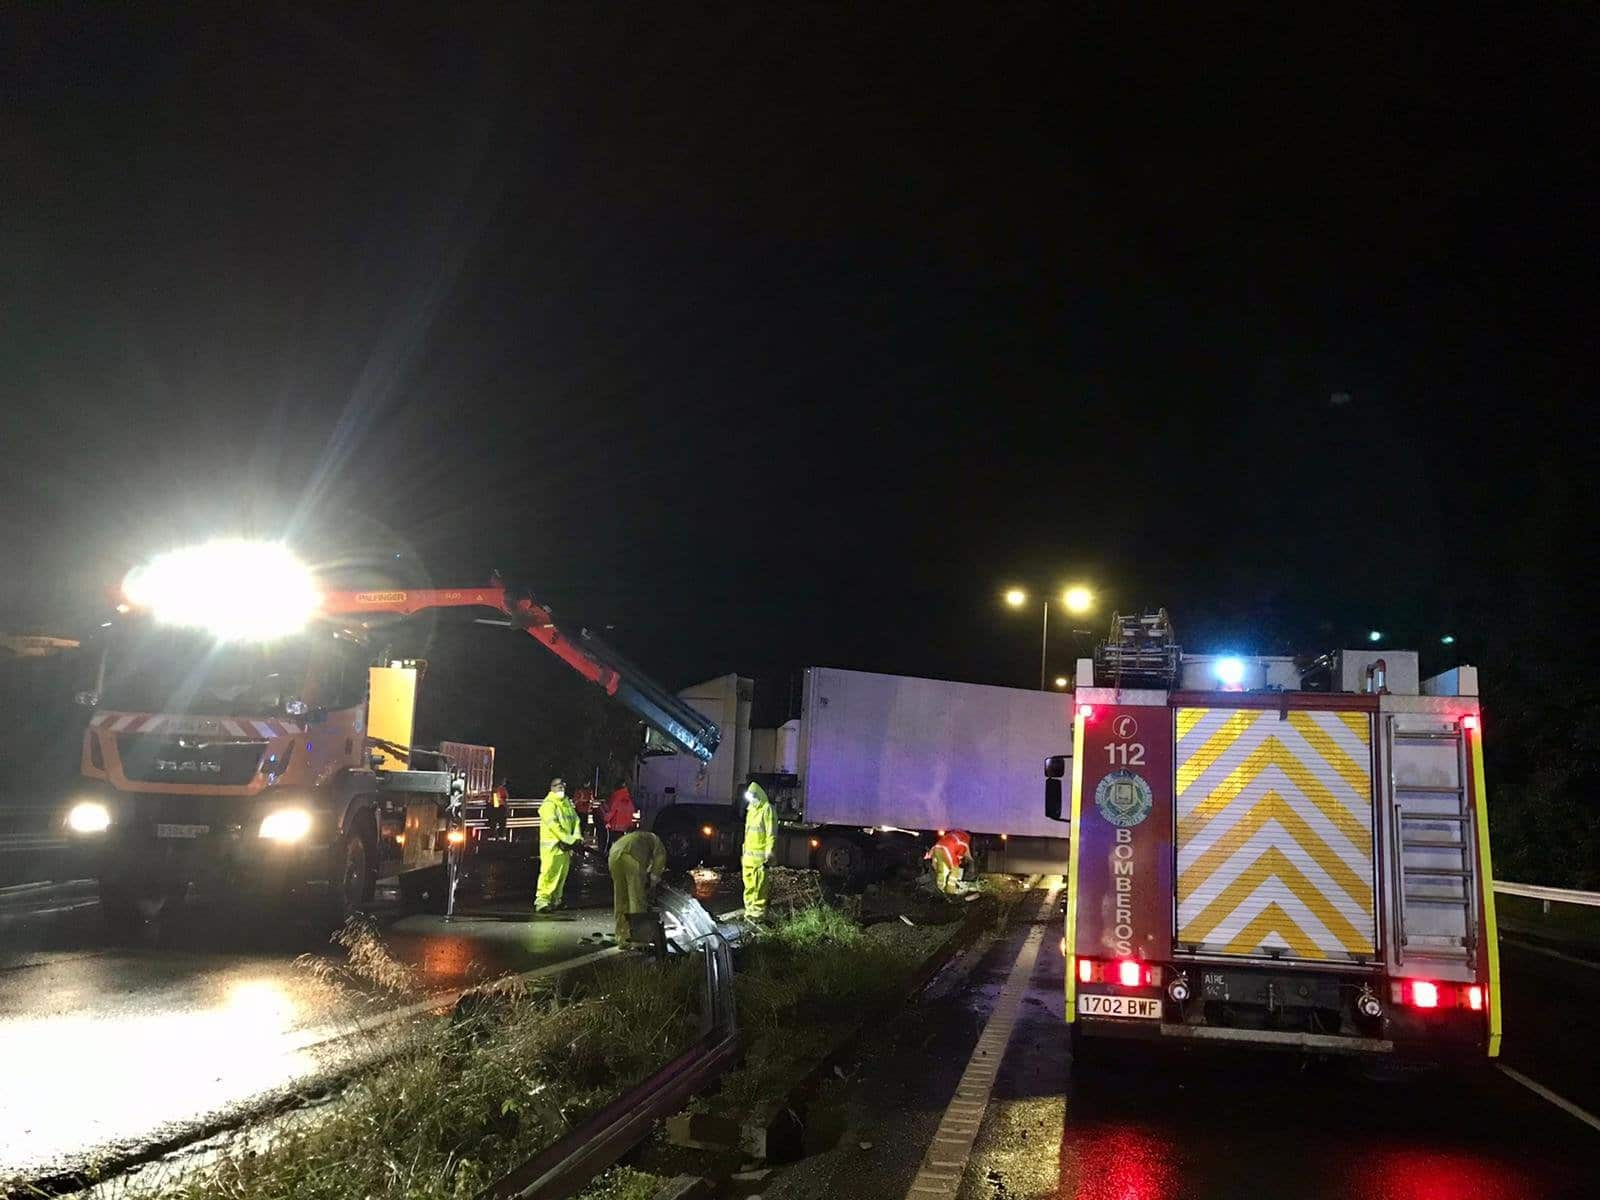 Tijera - Mañana con accidentes en las carreteras gipuzkoanas